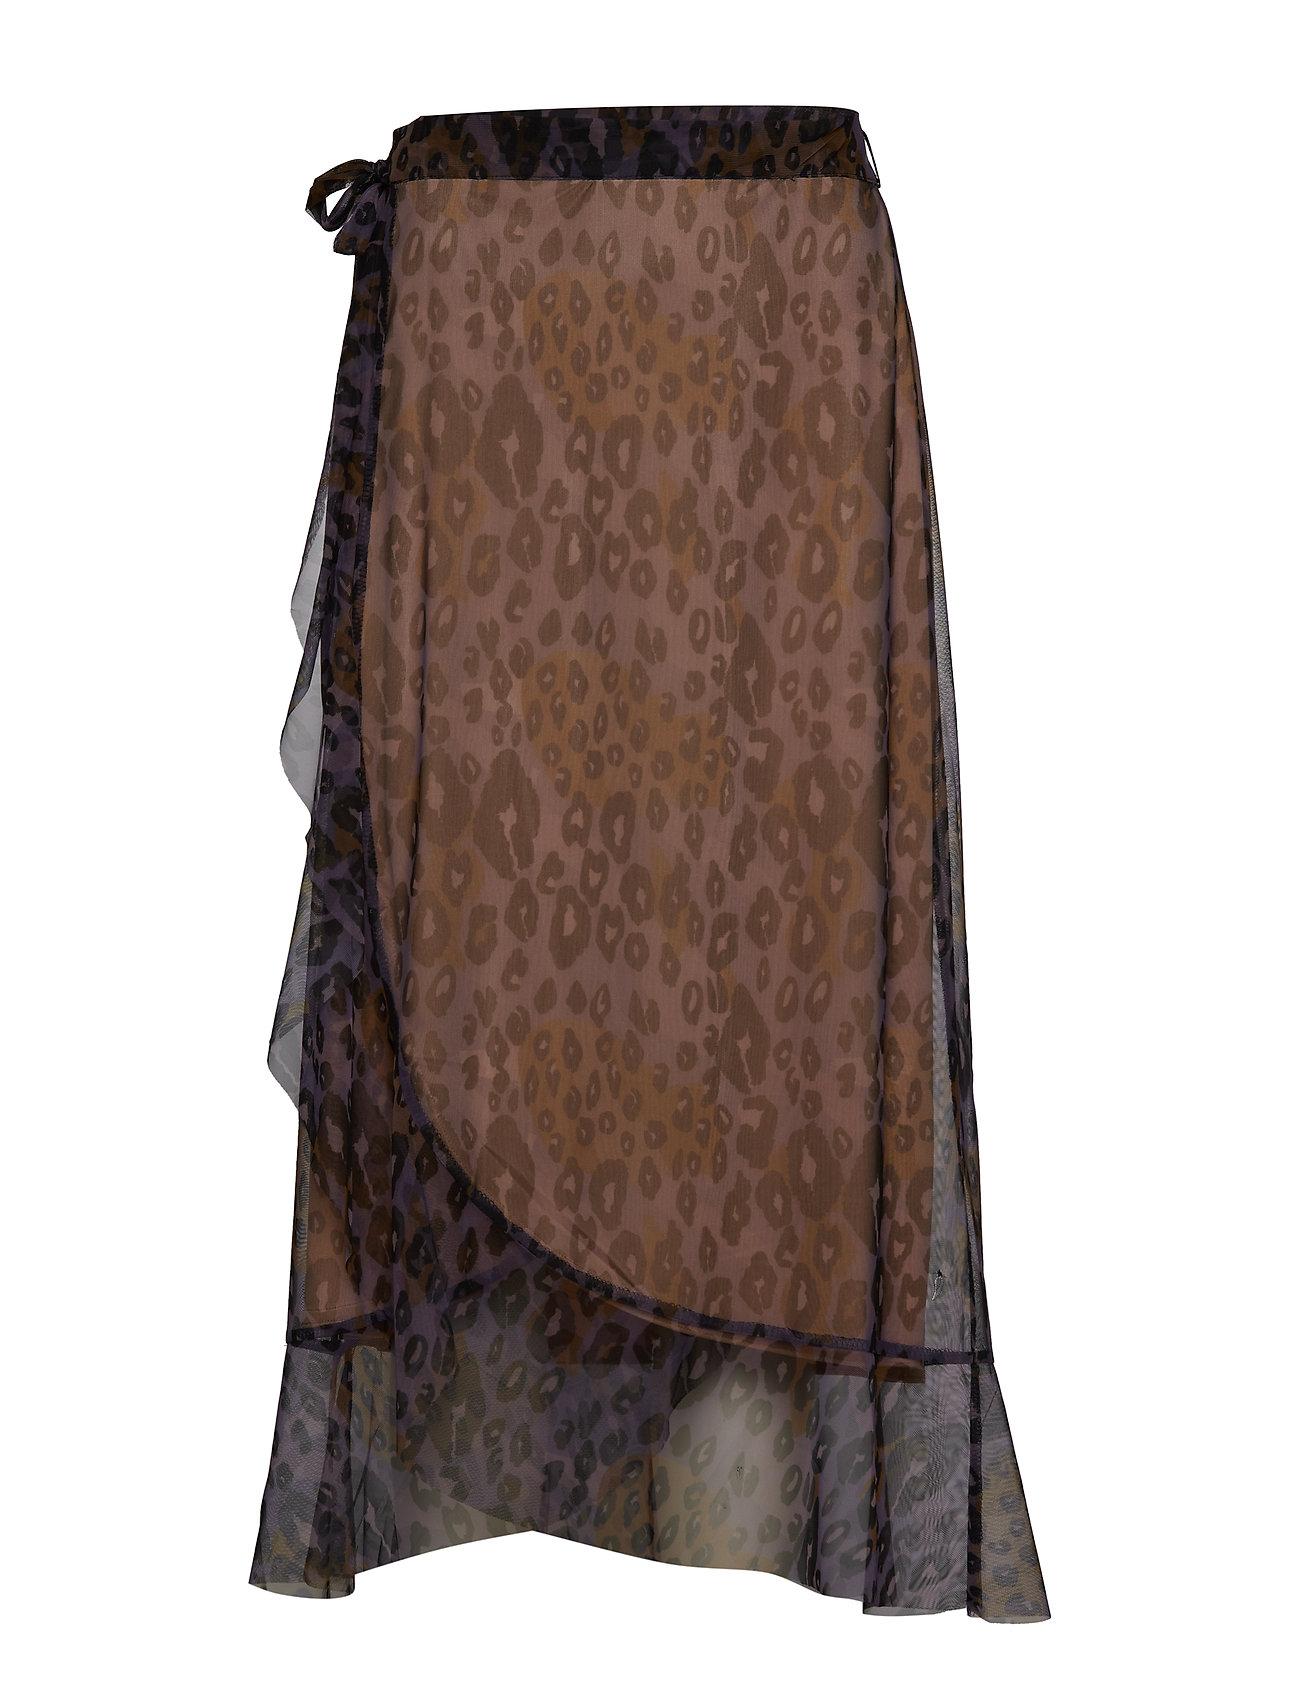 afd9e432820f Skirt In Tiger Print W. Wrap Effect (Purple Leopard Print) (99 ...